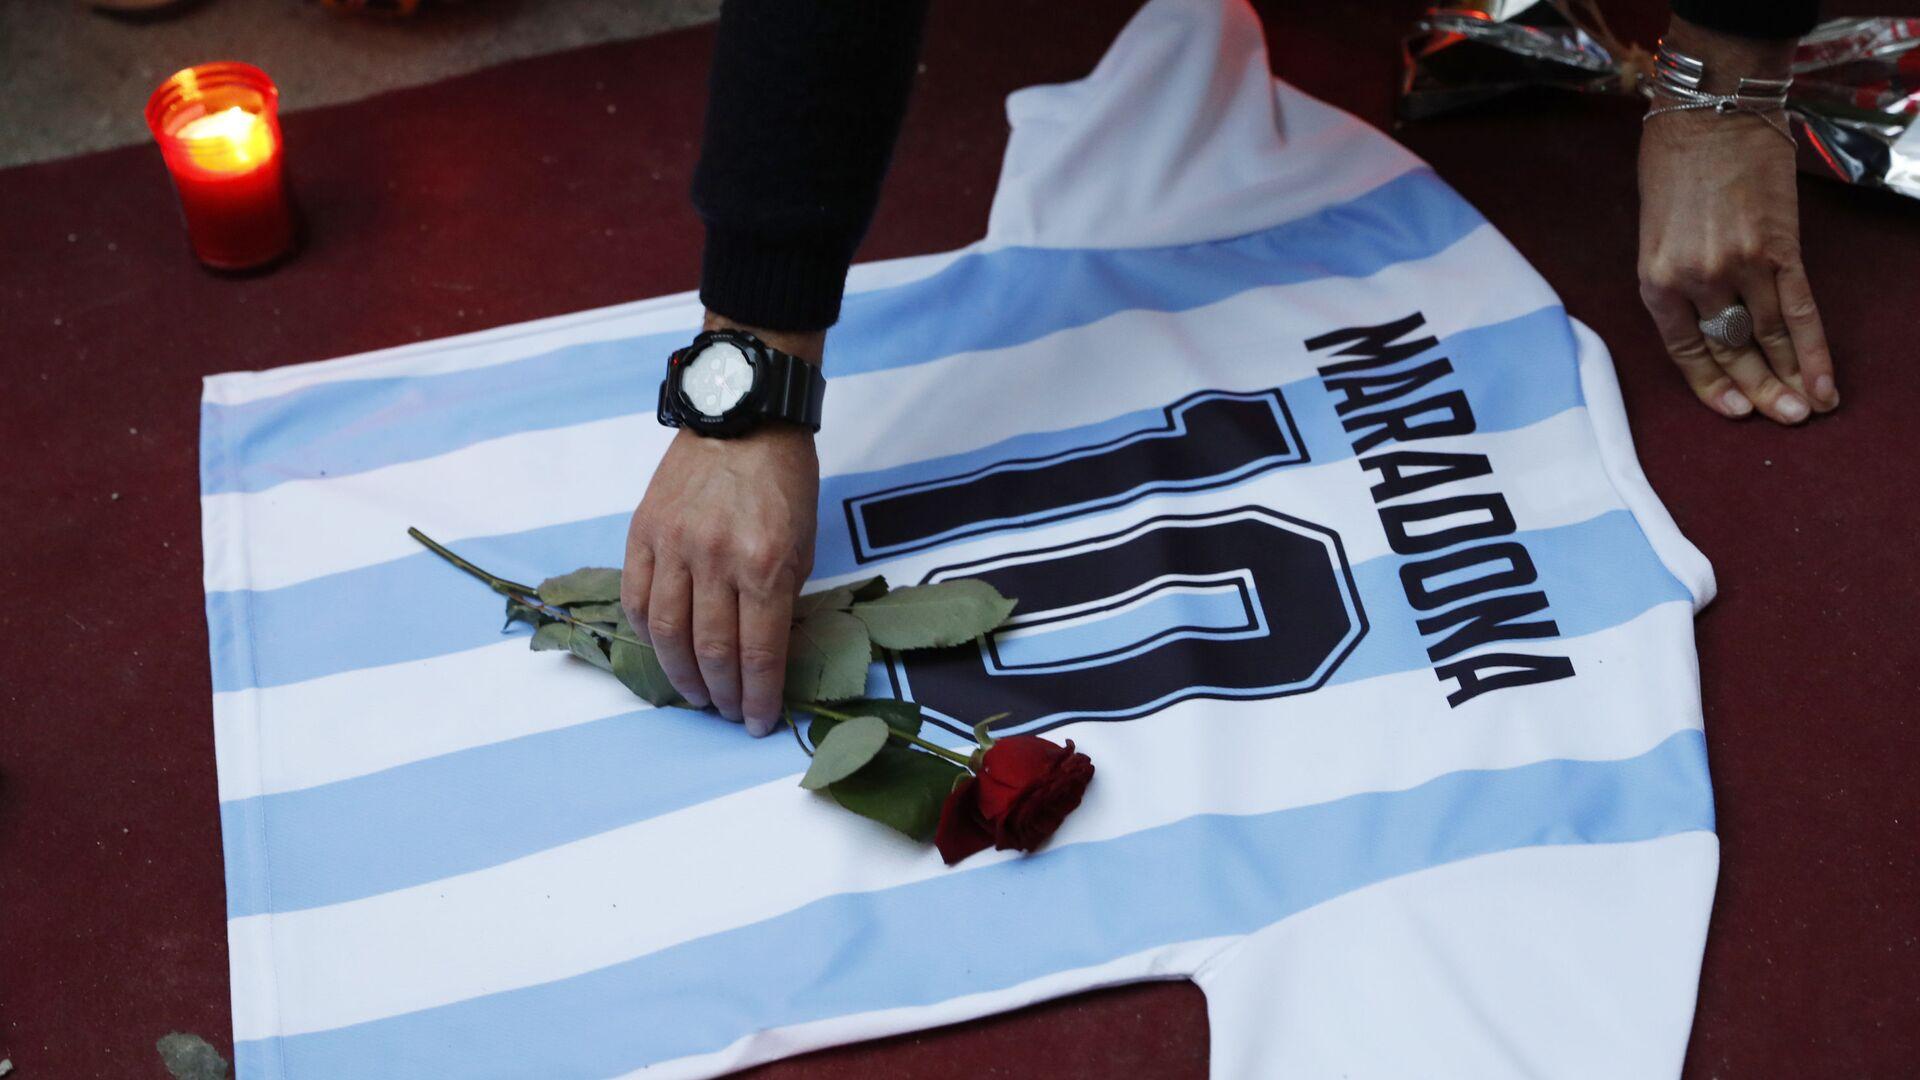 Homenaje al futbolista argentino Diego Maradona - Sputnik Mundo, 1920, 10.03.2021